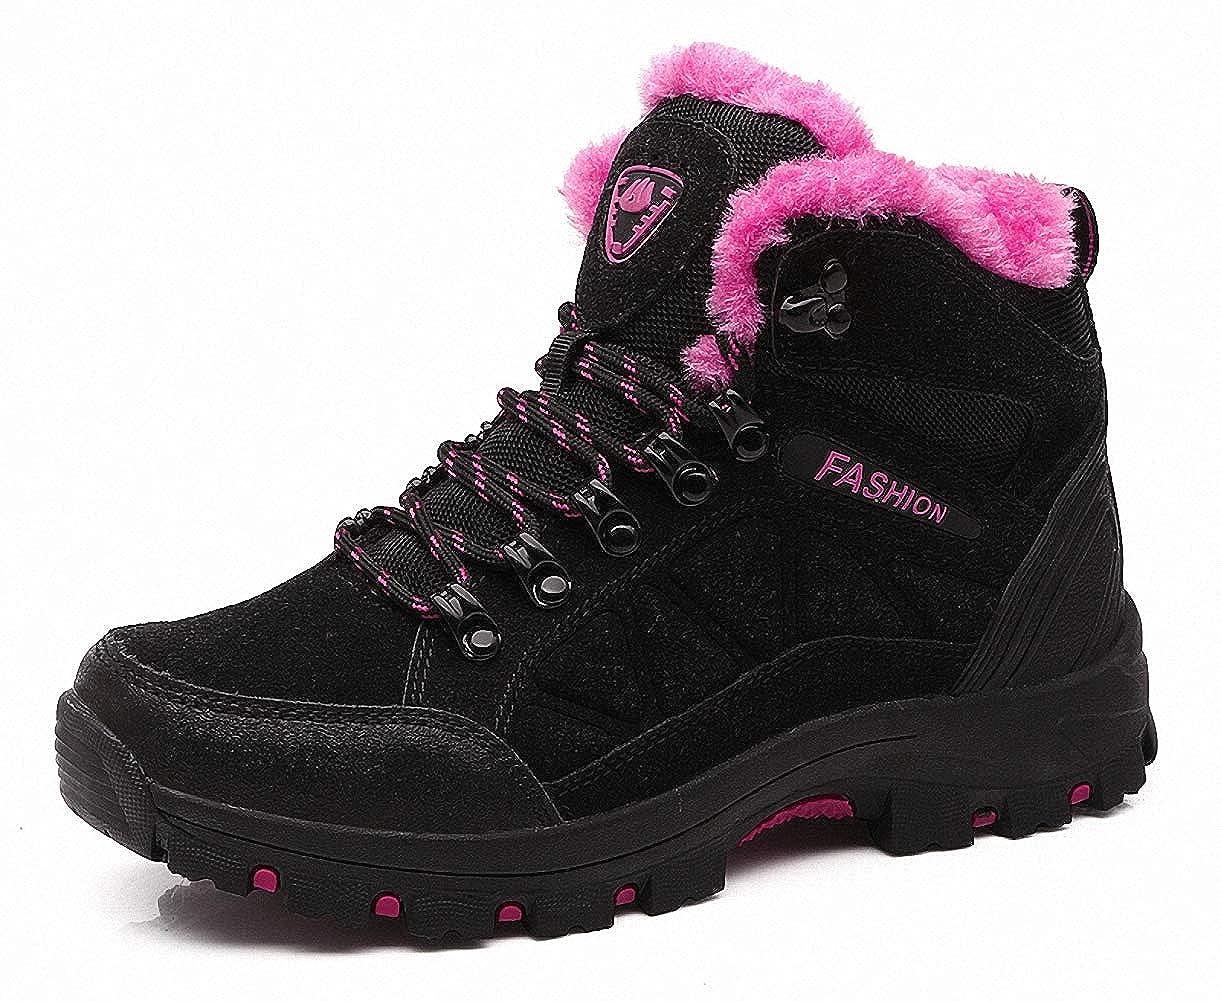 Blackpink 7 B(M) US = 9 1 4  (heel to toe) ZHENZHONG Women's Warm Faux Fur Hiking Trekking Boots Walking Outdoor Boots